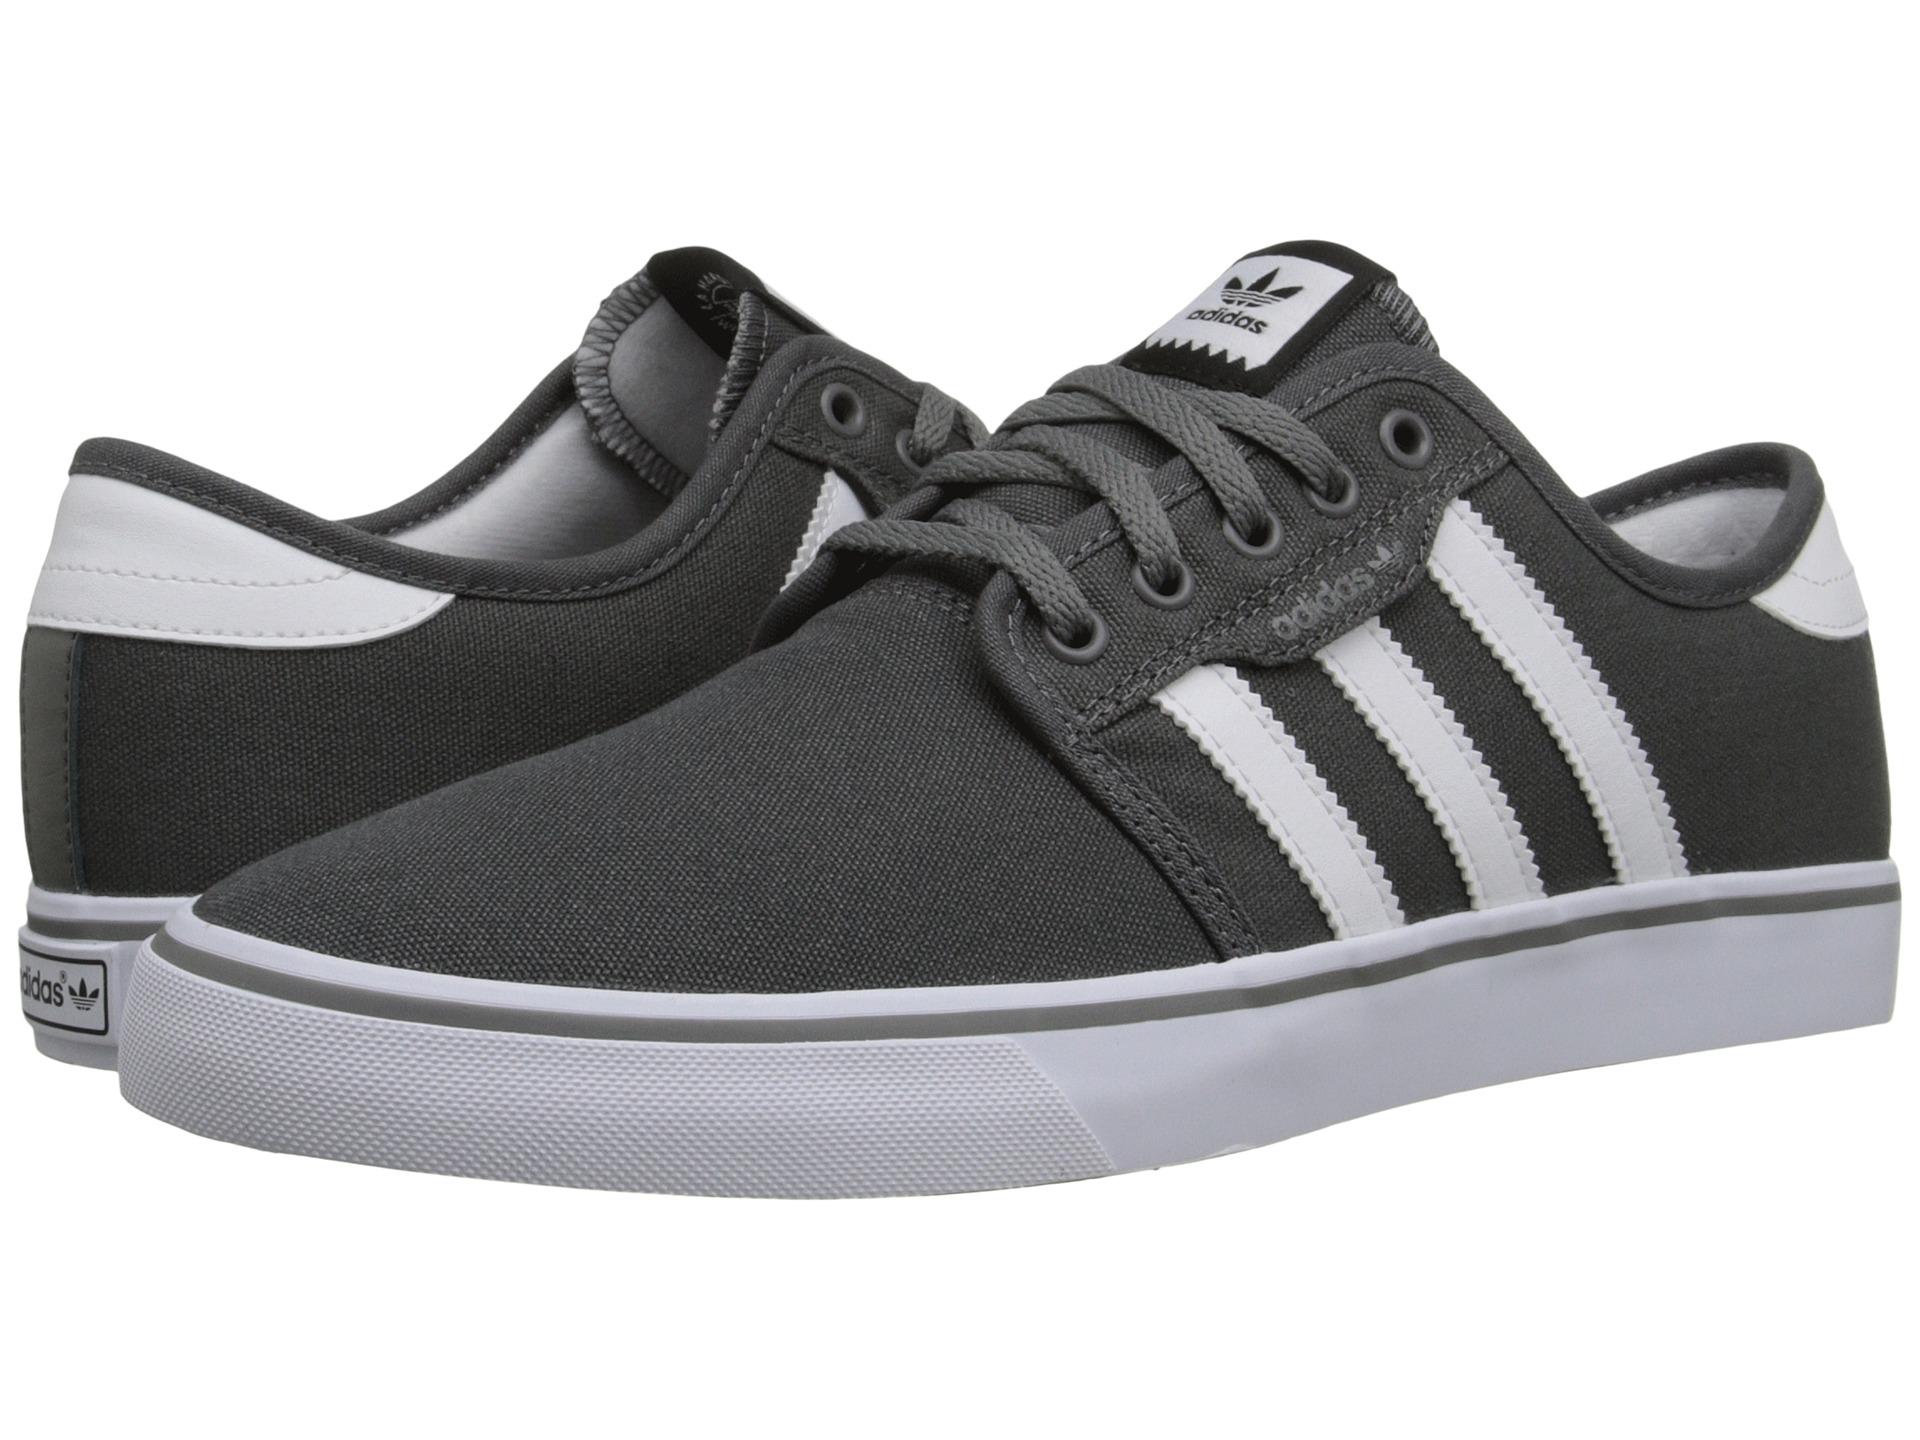 Adidas Seeley Skate Men S Shoes